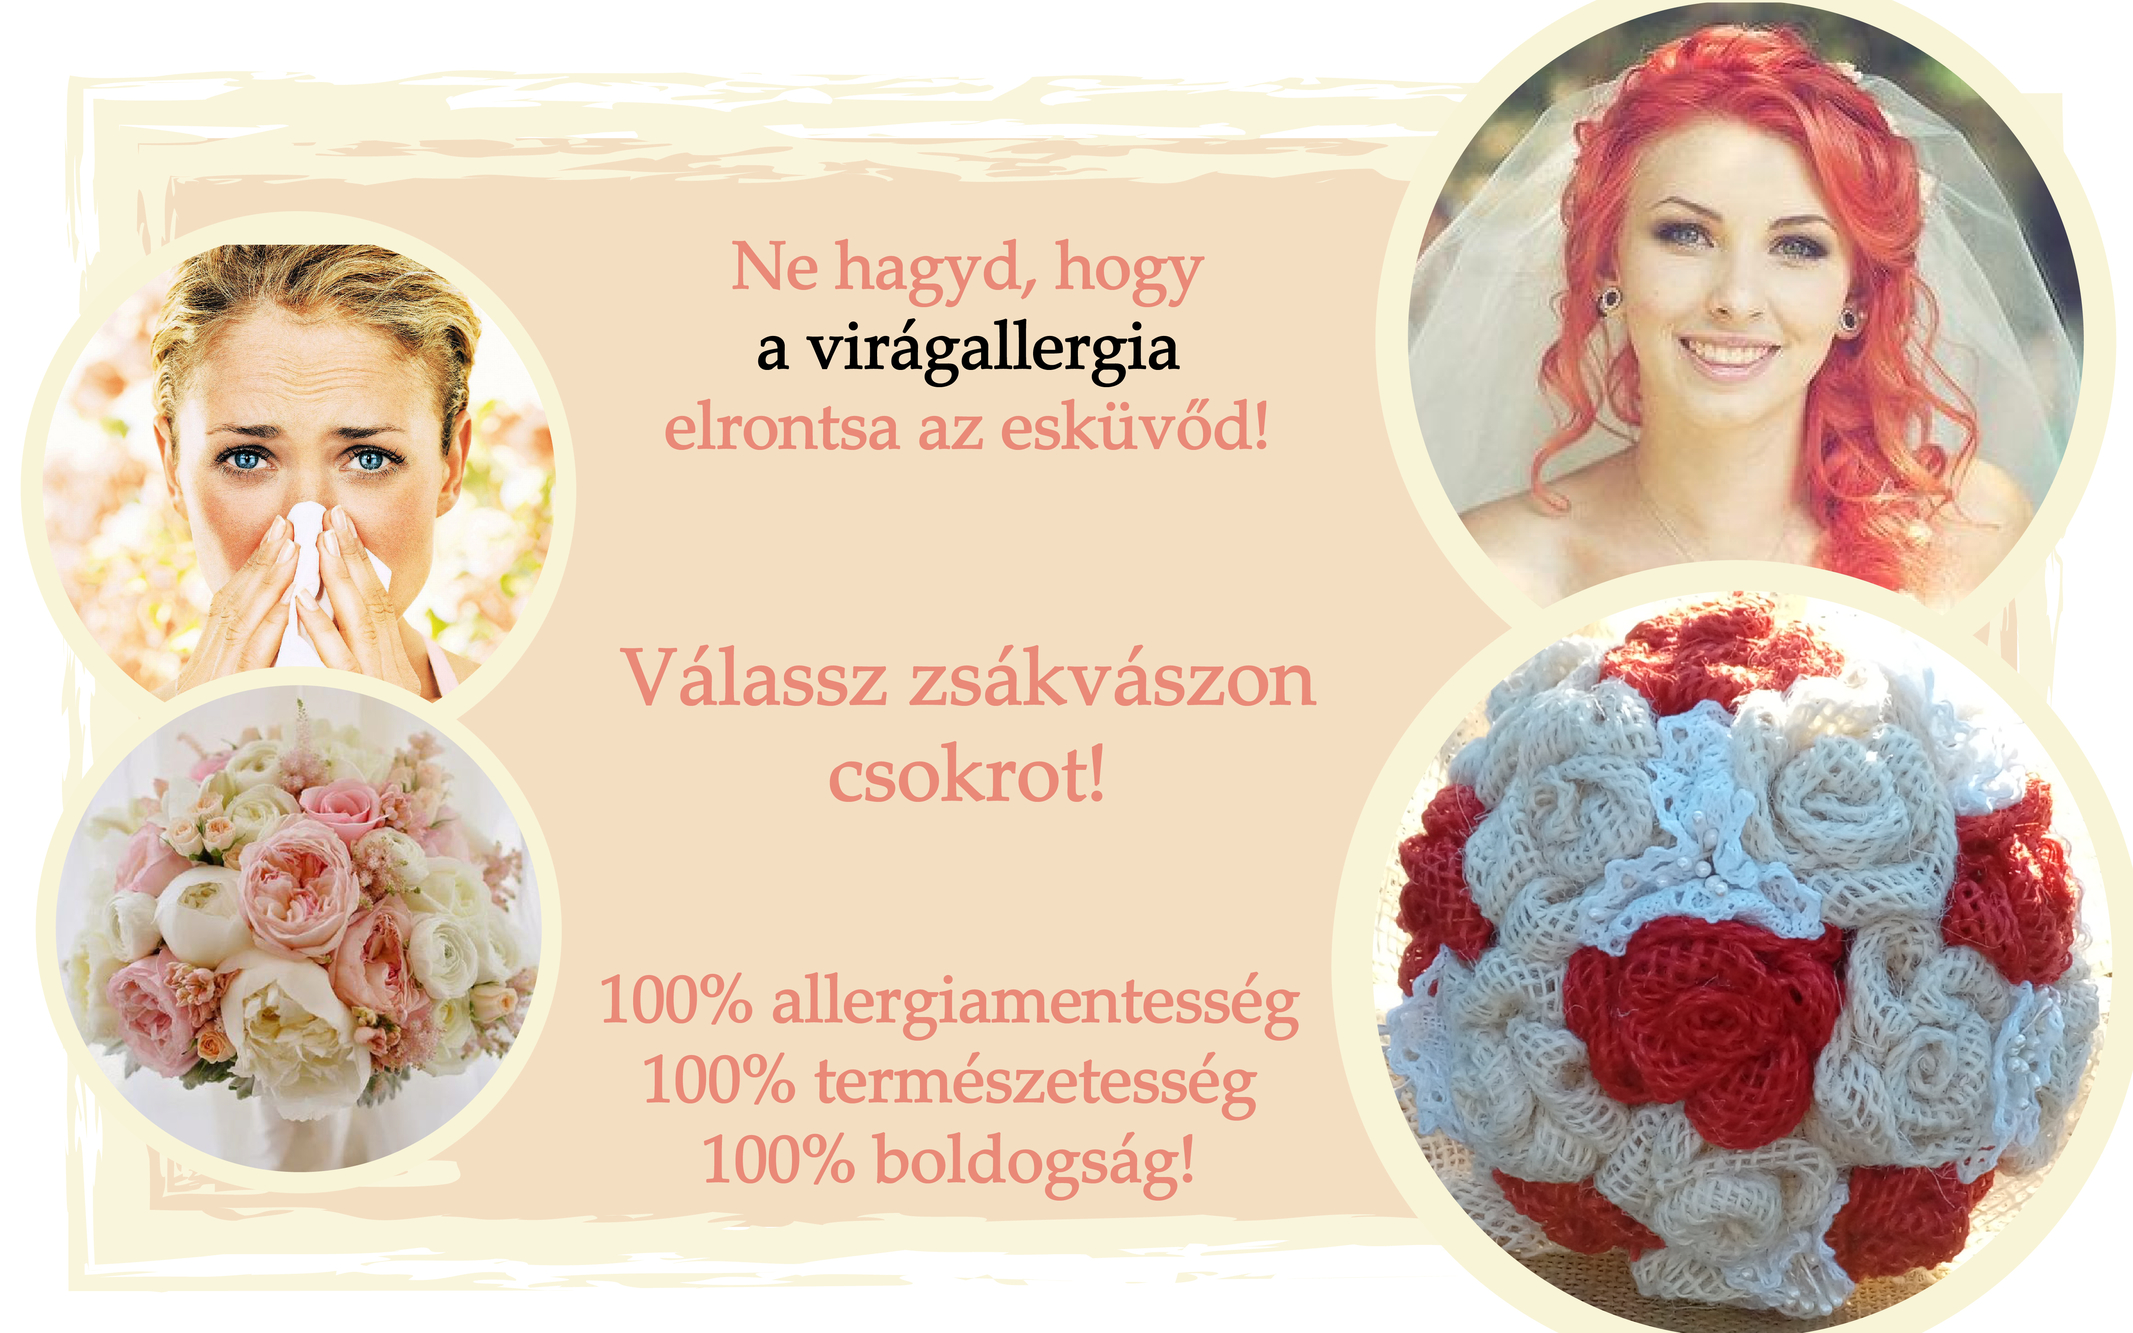 allergia2-01.jpg